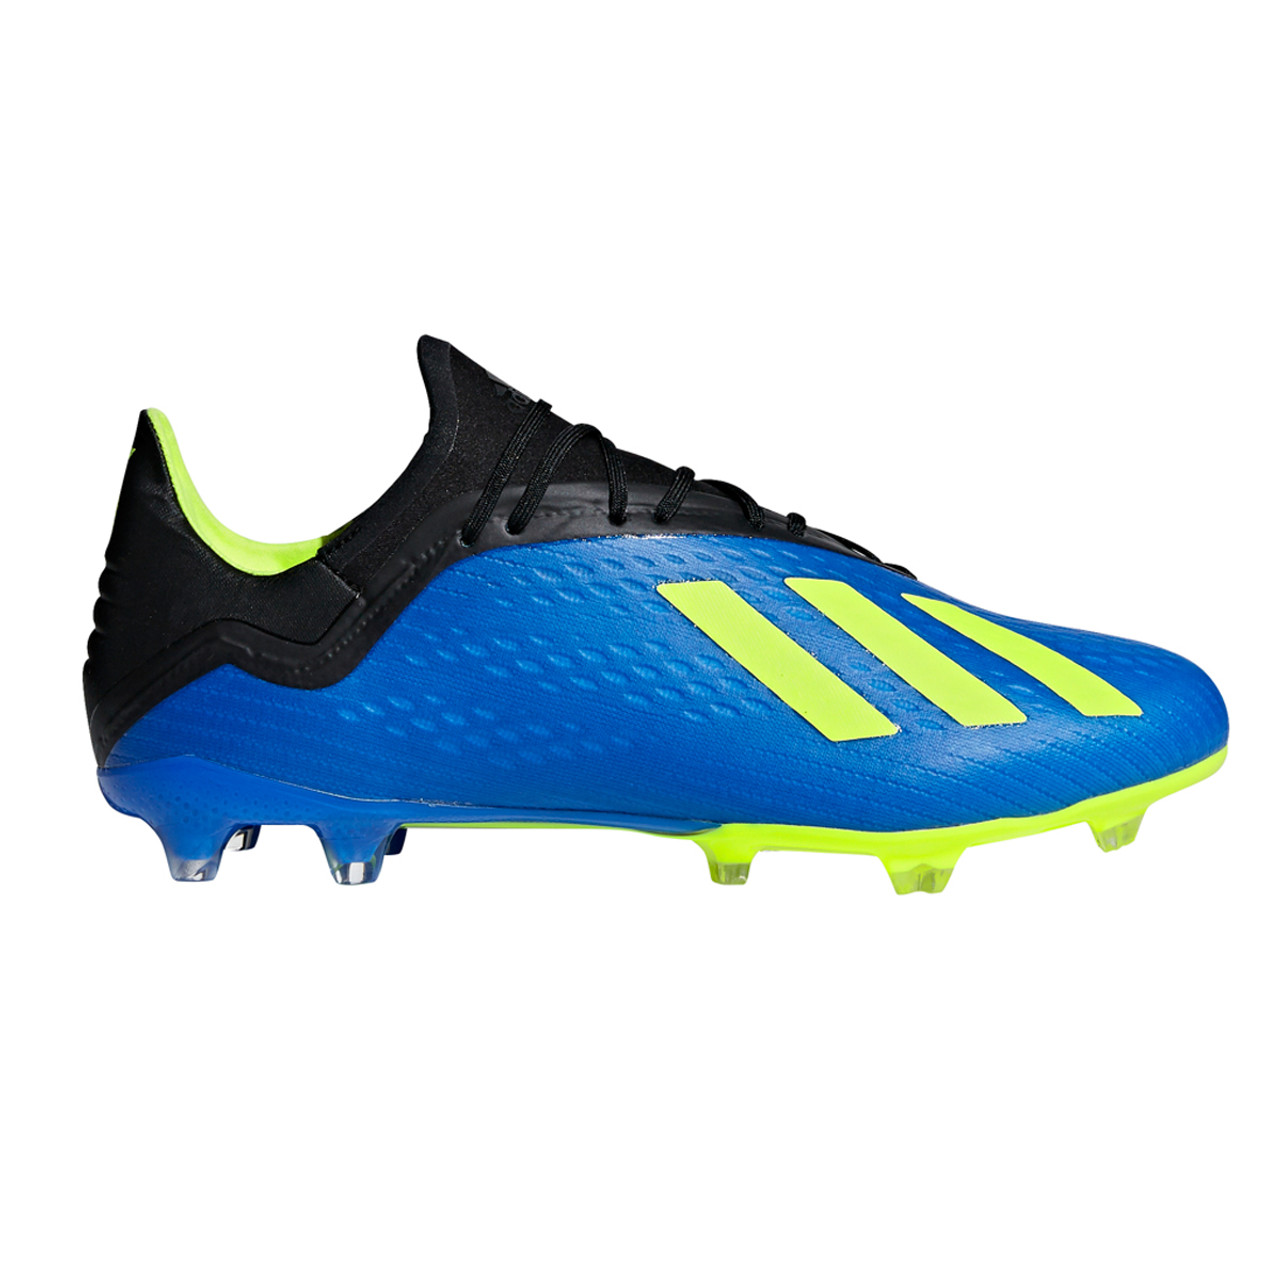 brand new c659a 5fc17 Adidas X 18.2 FG Men s Soccer Cleats DA9334 - Black, Blue, Lime